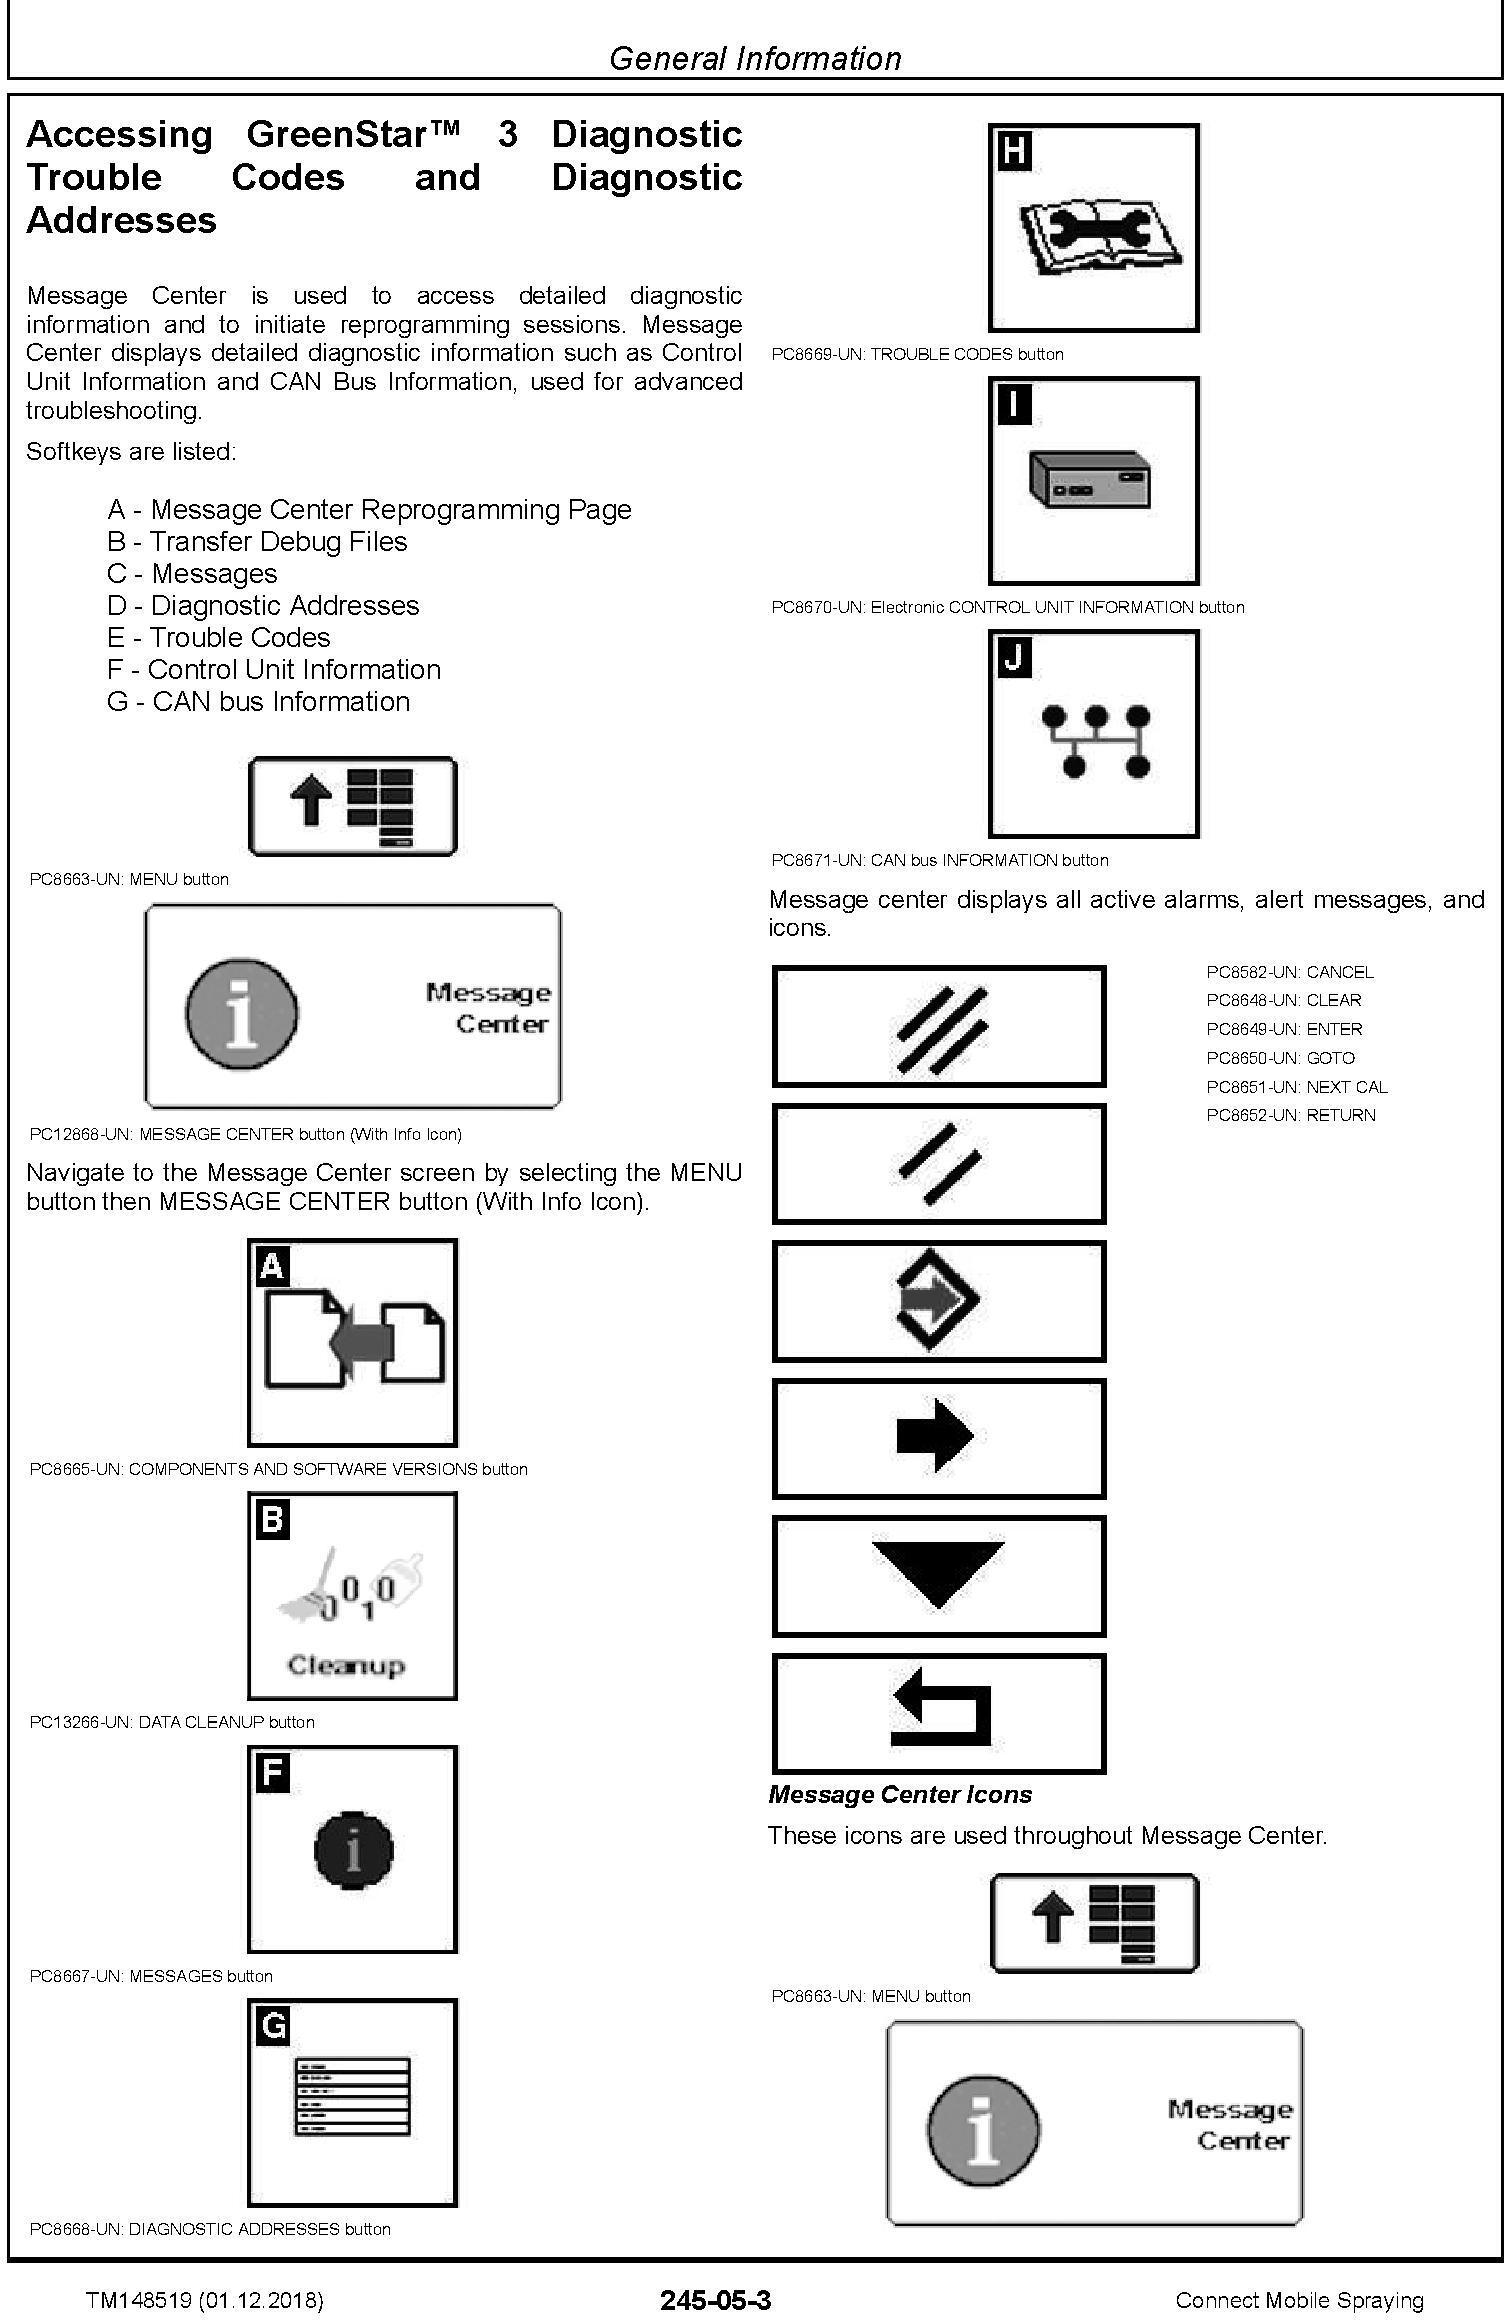 John Deere Connect Mobile Spraying Repair Technical Service Manual (TM148519) - 1